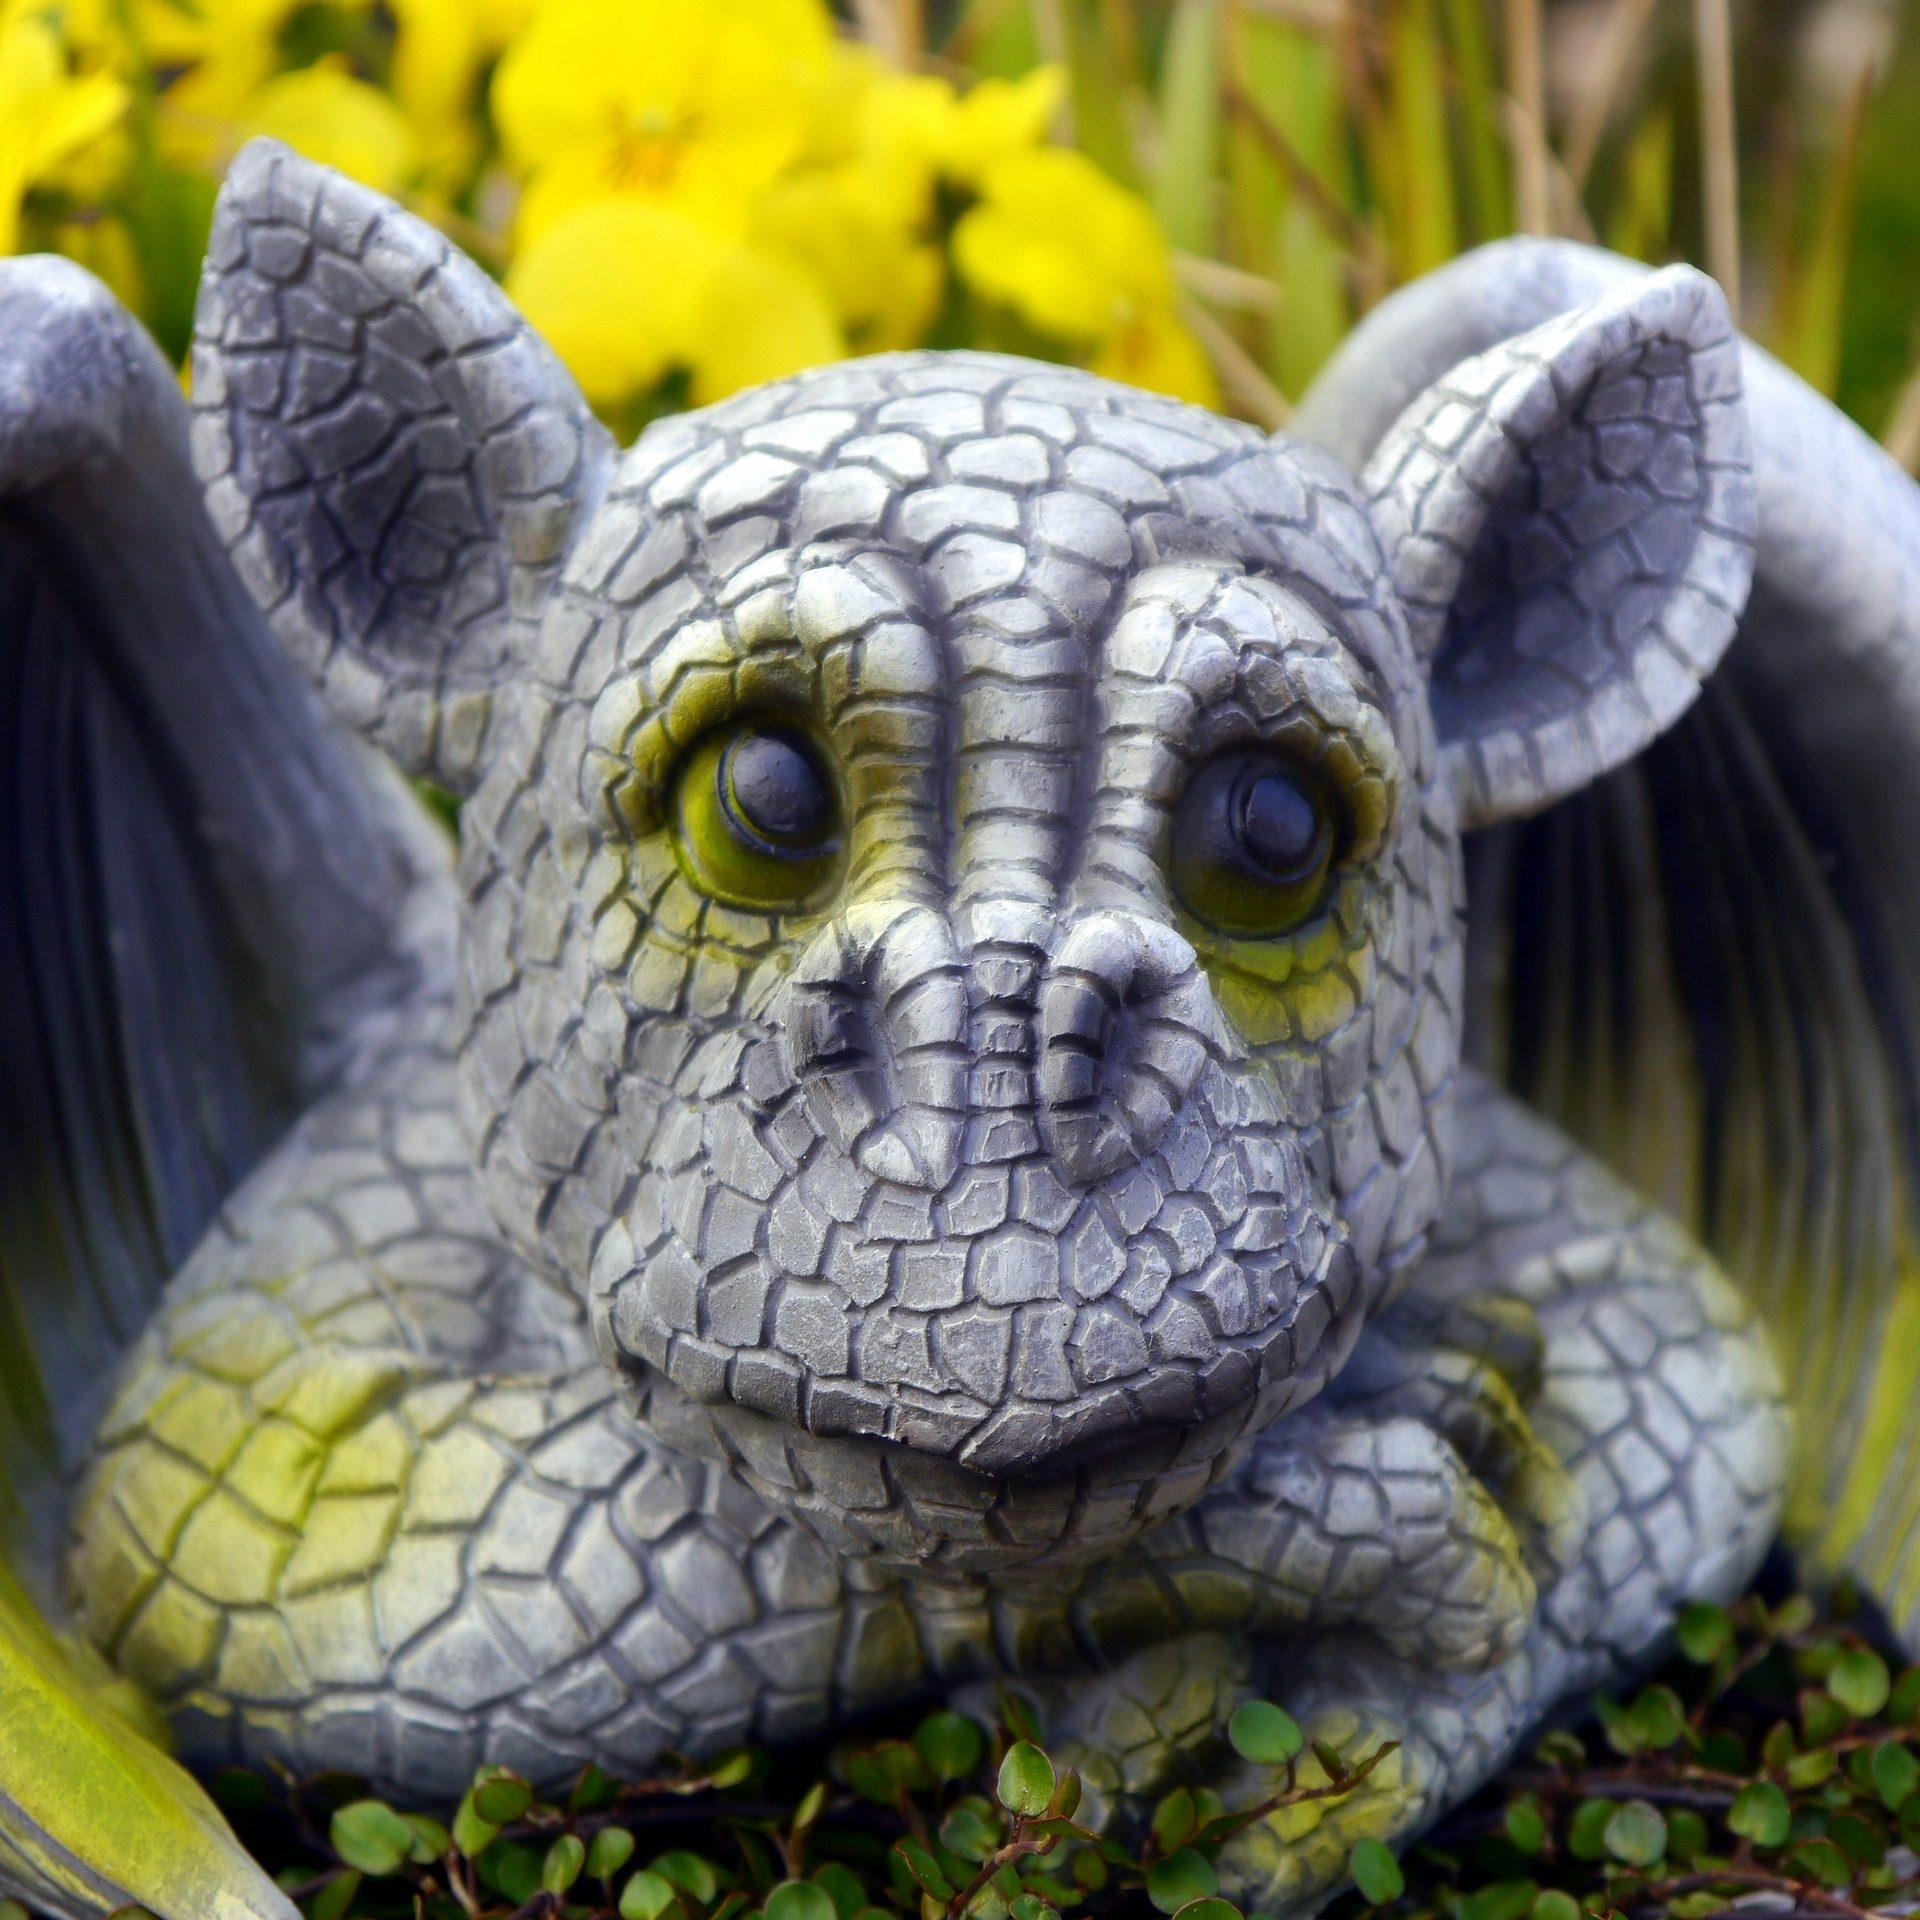 Dragão, Figura, escultura, Jardim, boneco de neve - Papéis de parede HD - Professor-falken.com